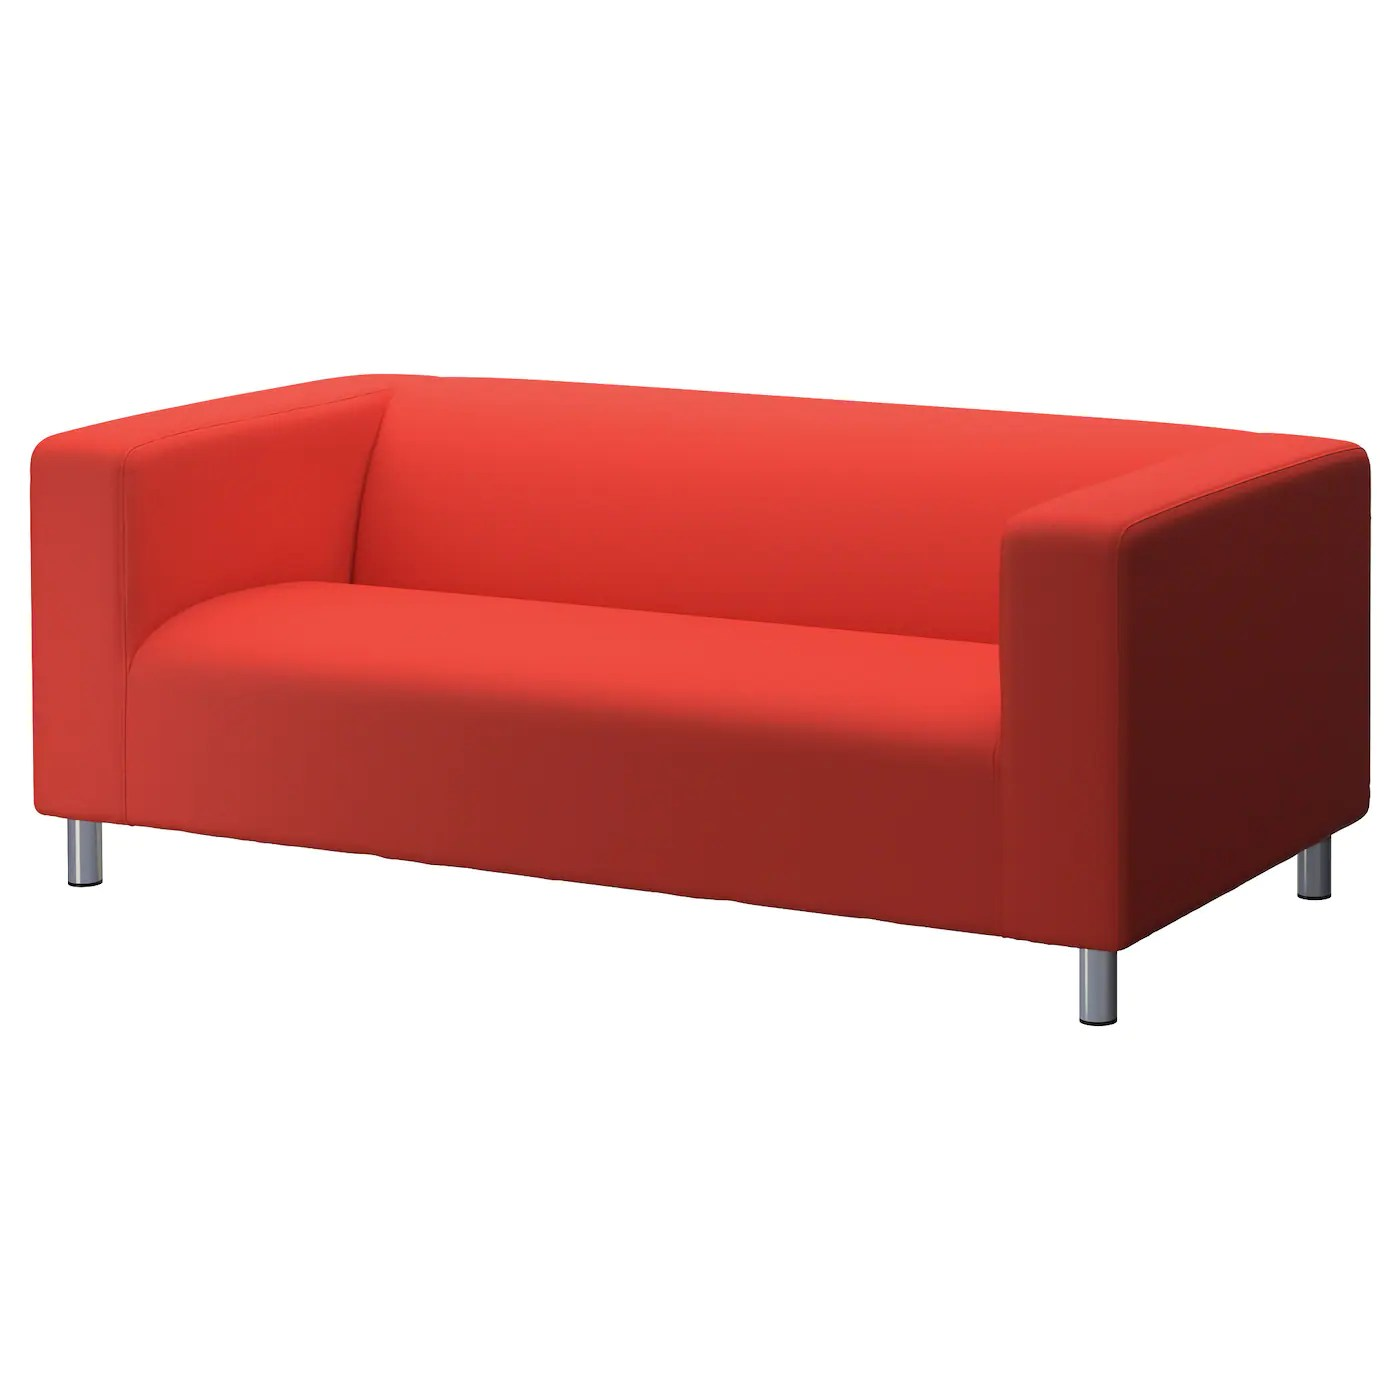 ikea klippan sofa cover red nesting tables two seat flackarp orange